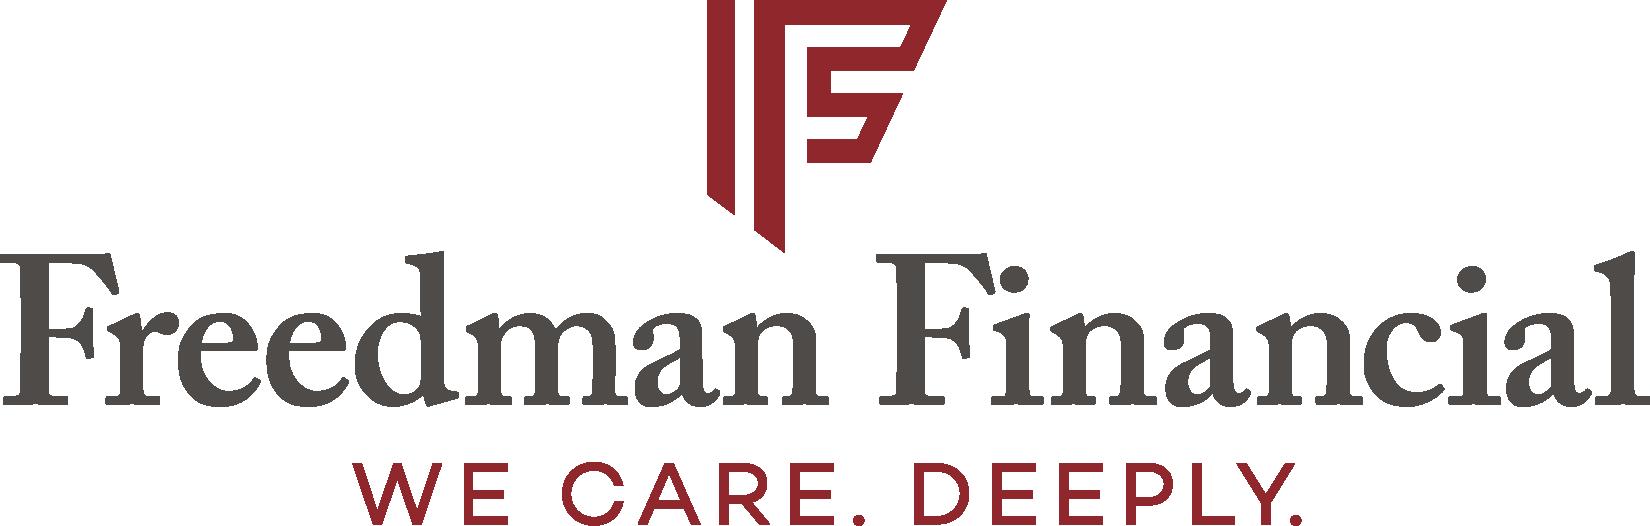 FreedmanFinancial Logo